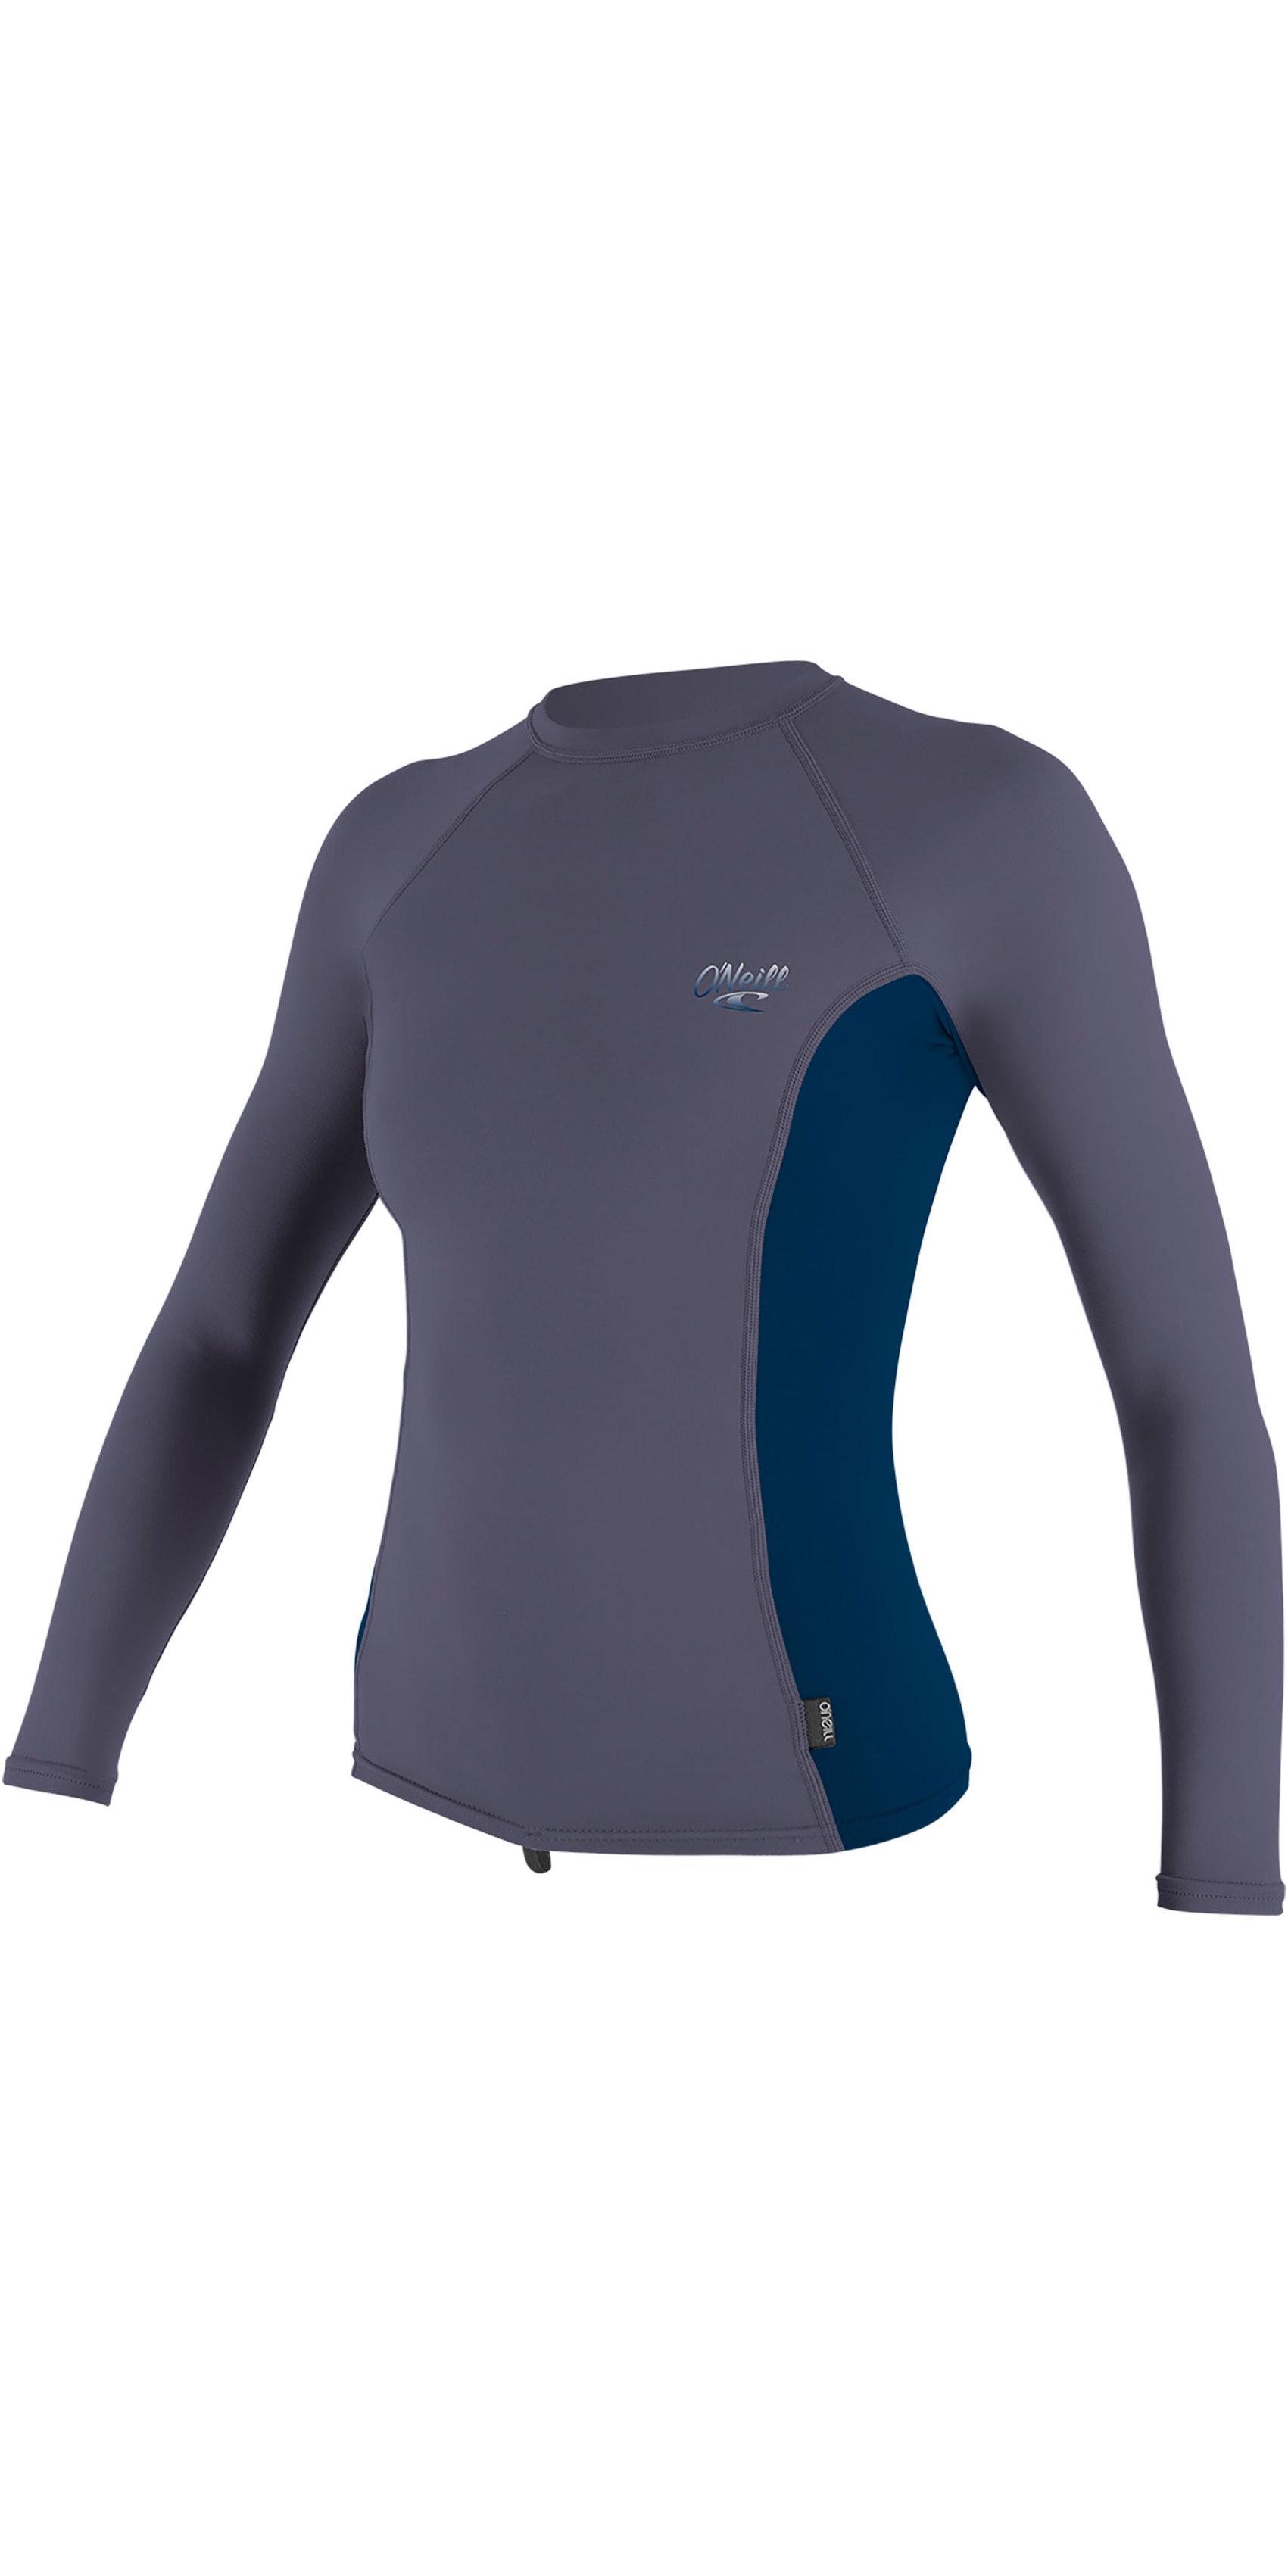 2019 O'Neill Womens Premium Skins Long Sleeve Rash Vest Dusk / Abyss 4172